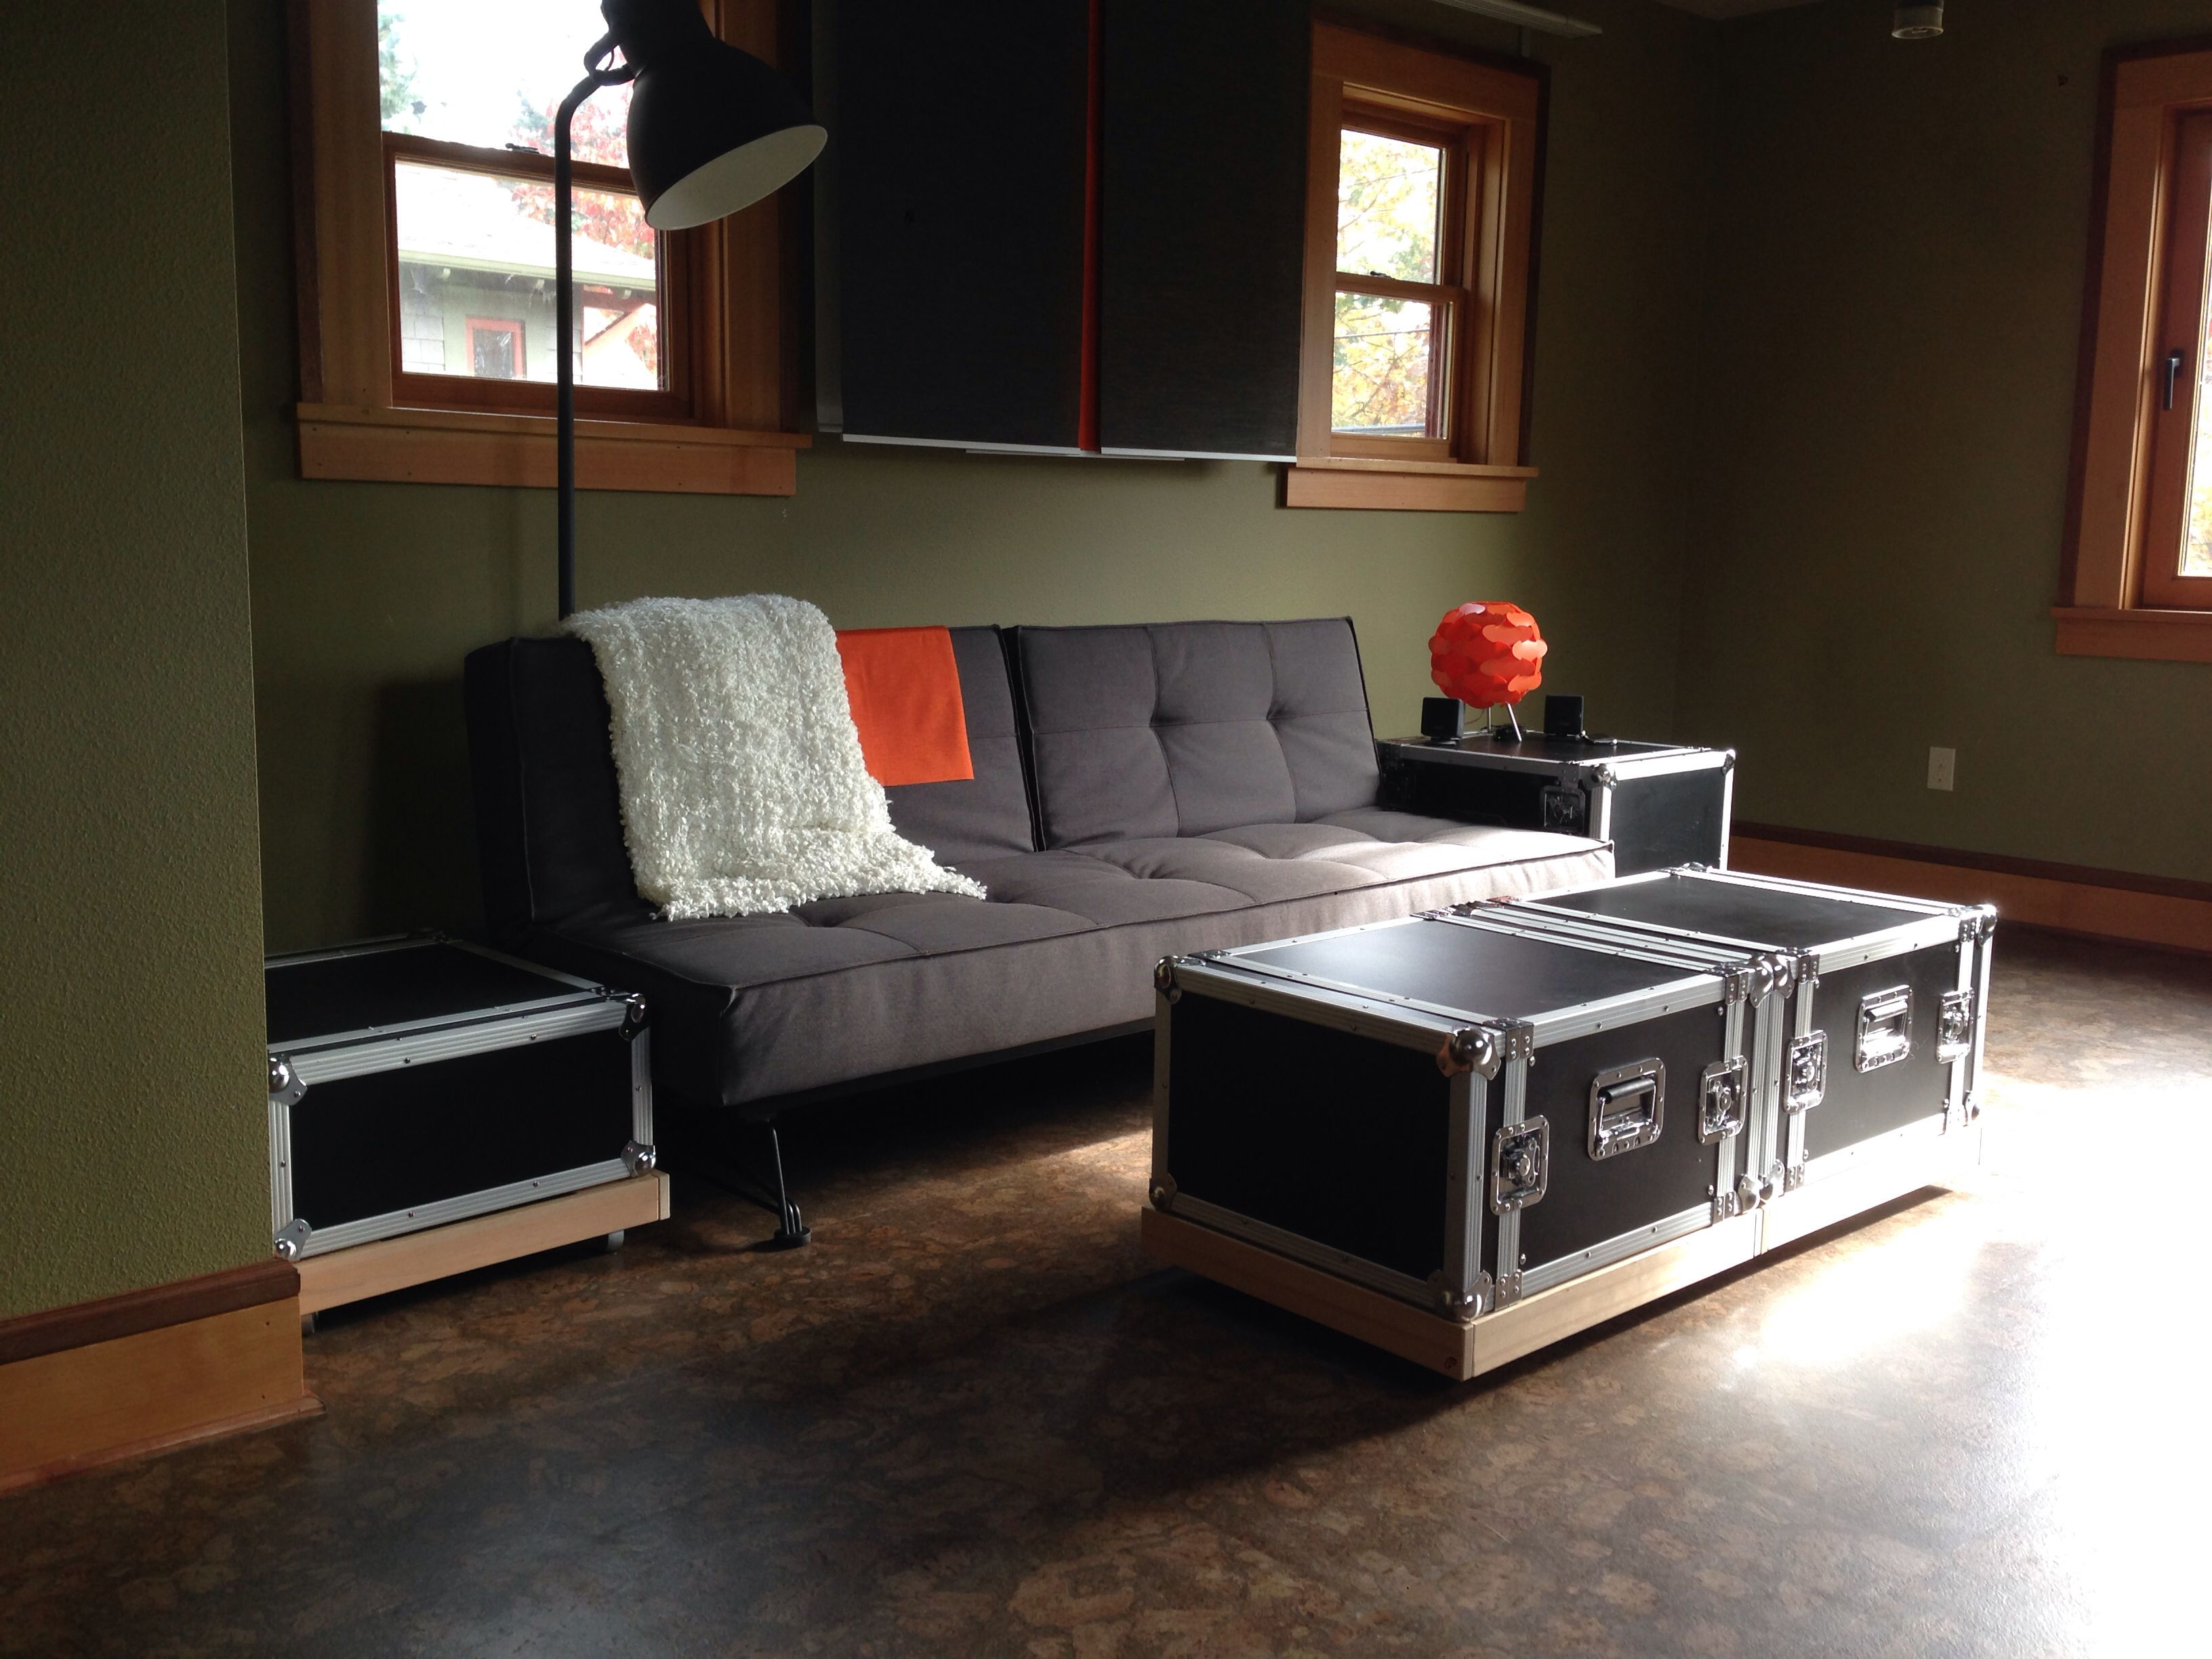 Road Case Furniture More